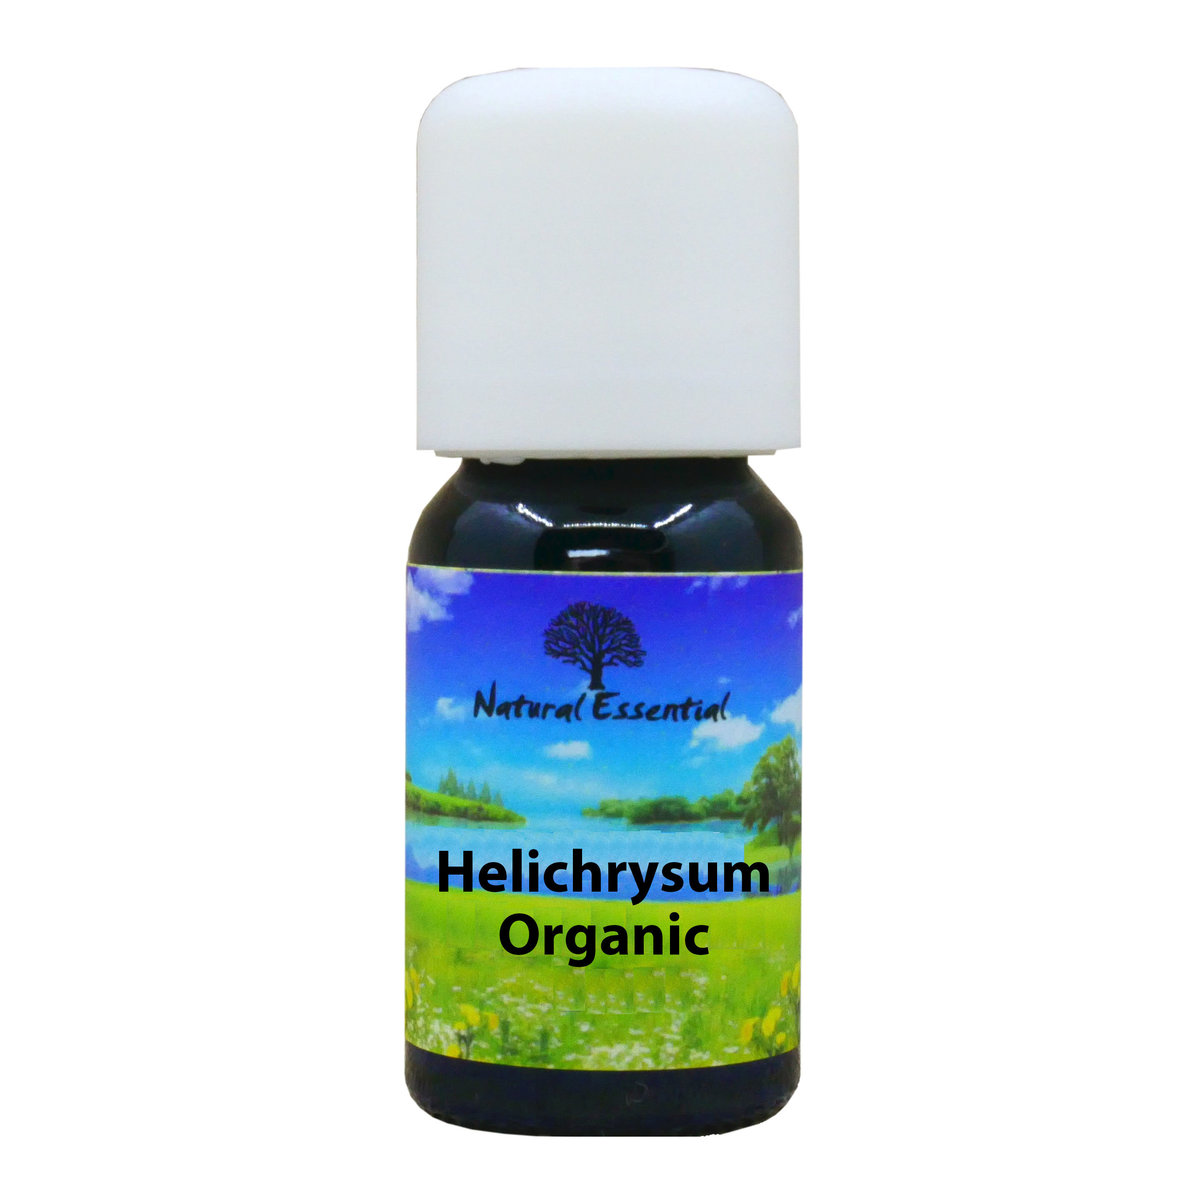 Helichrysum (Immortelle) Organic Essential Oil (Croatia)